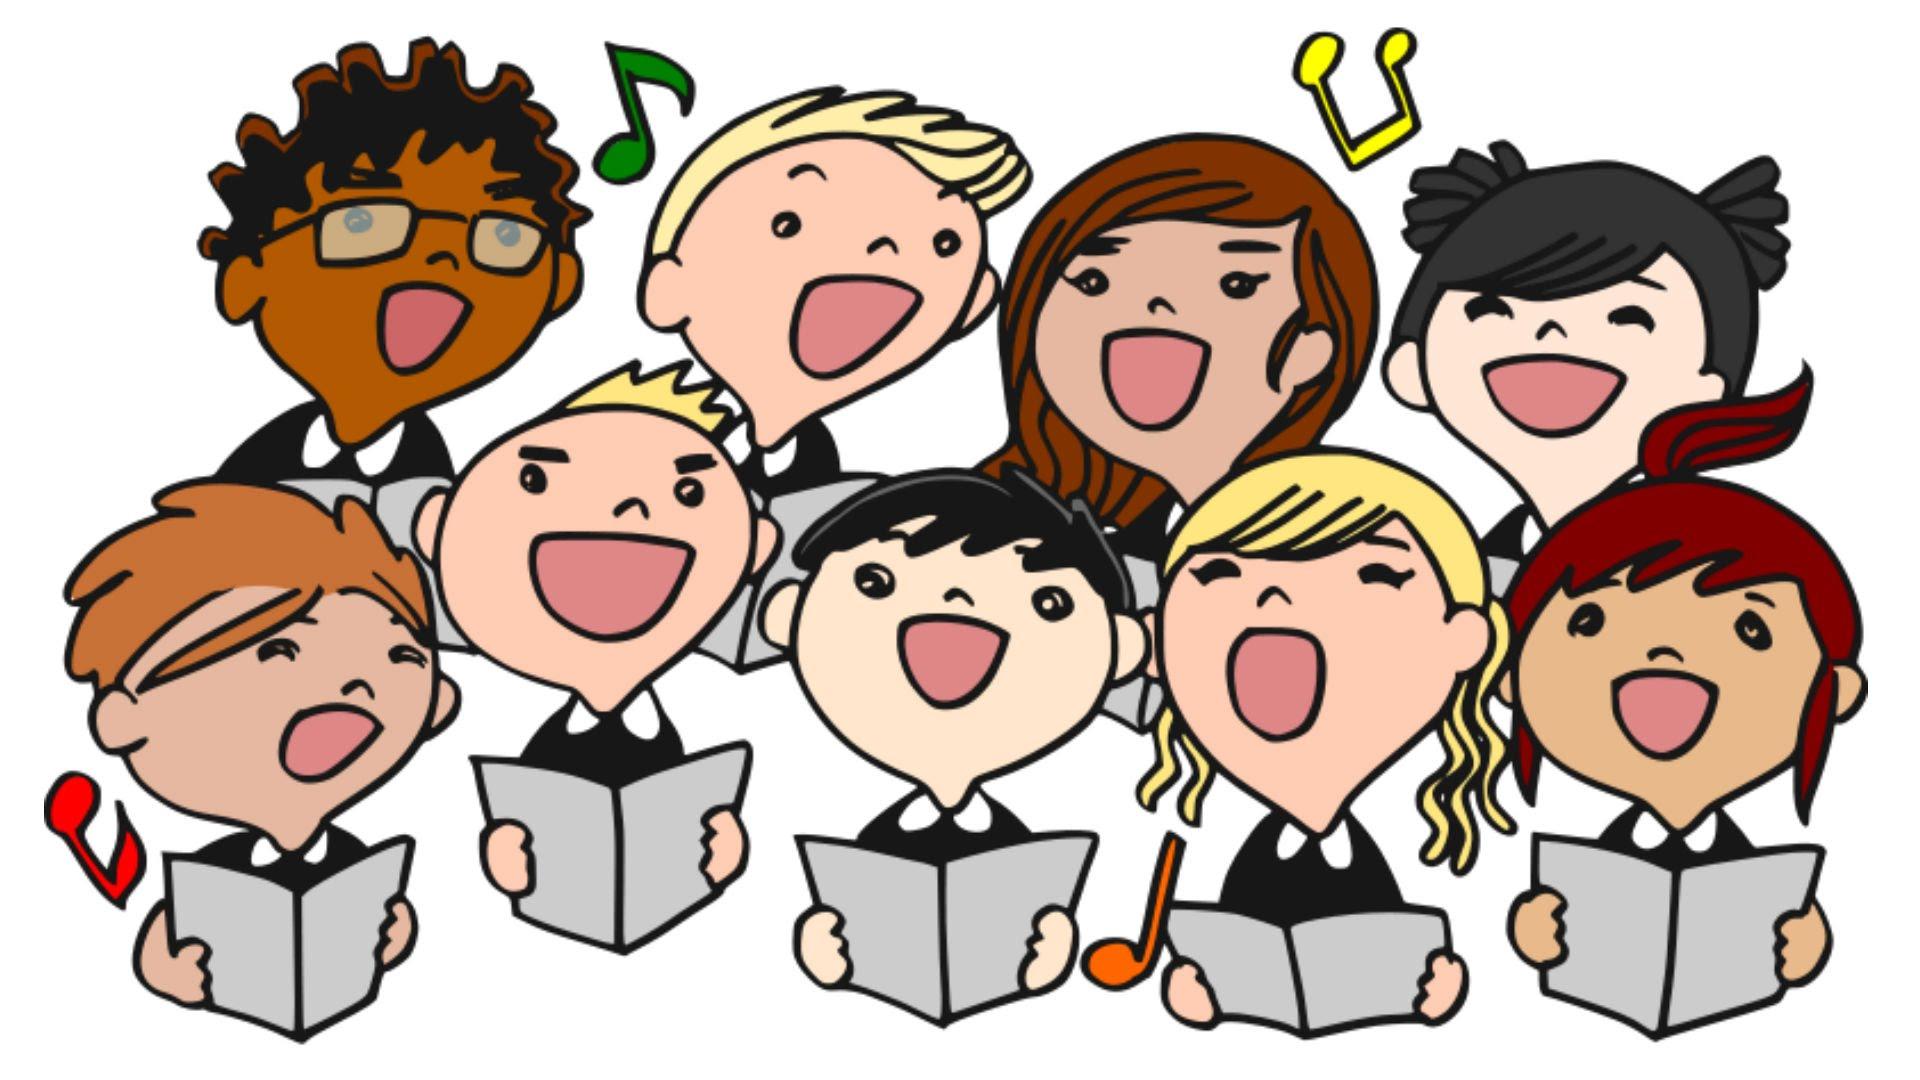 The benefits of singing. Chorus clipart child choir